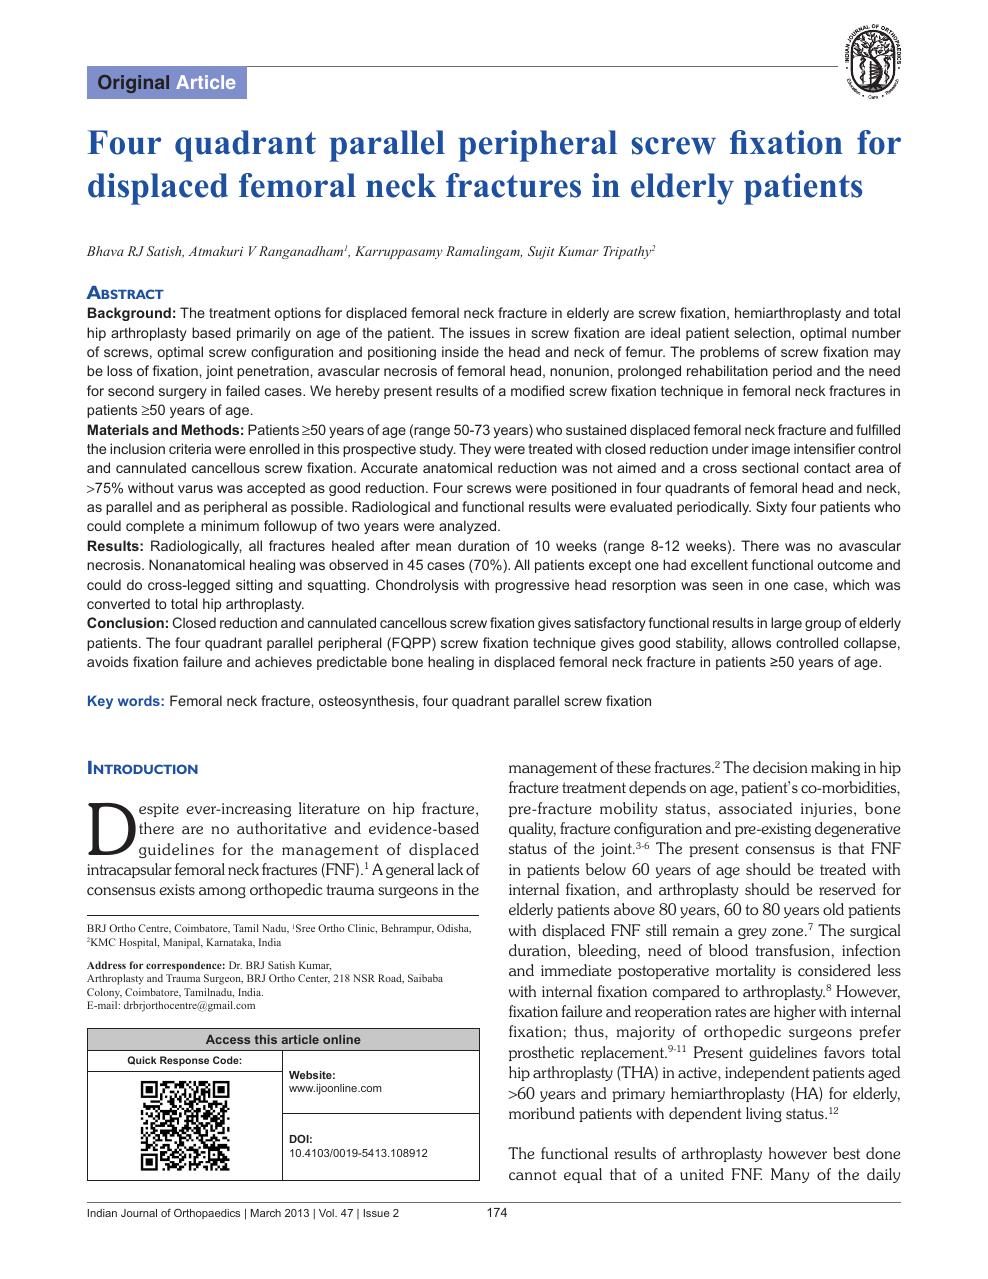 Four quadrant parallel peripheral screw fixation for